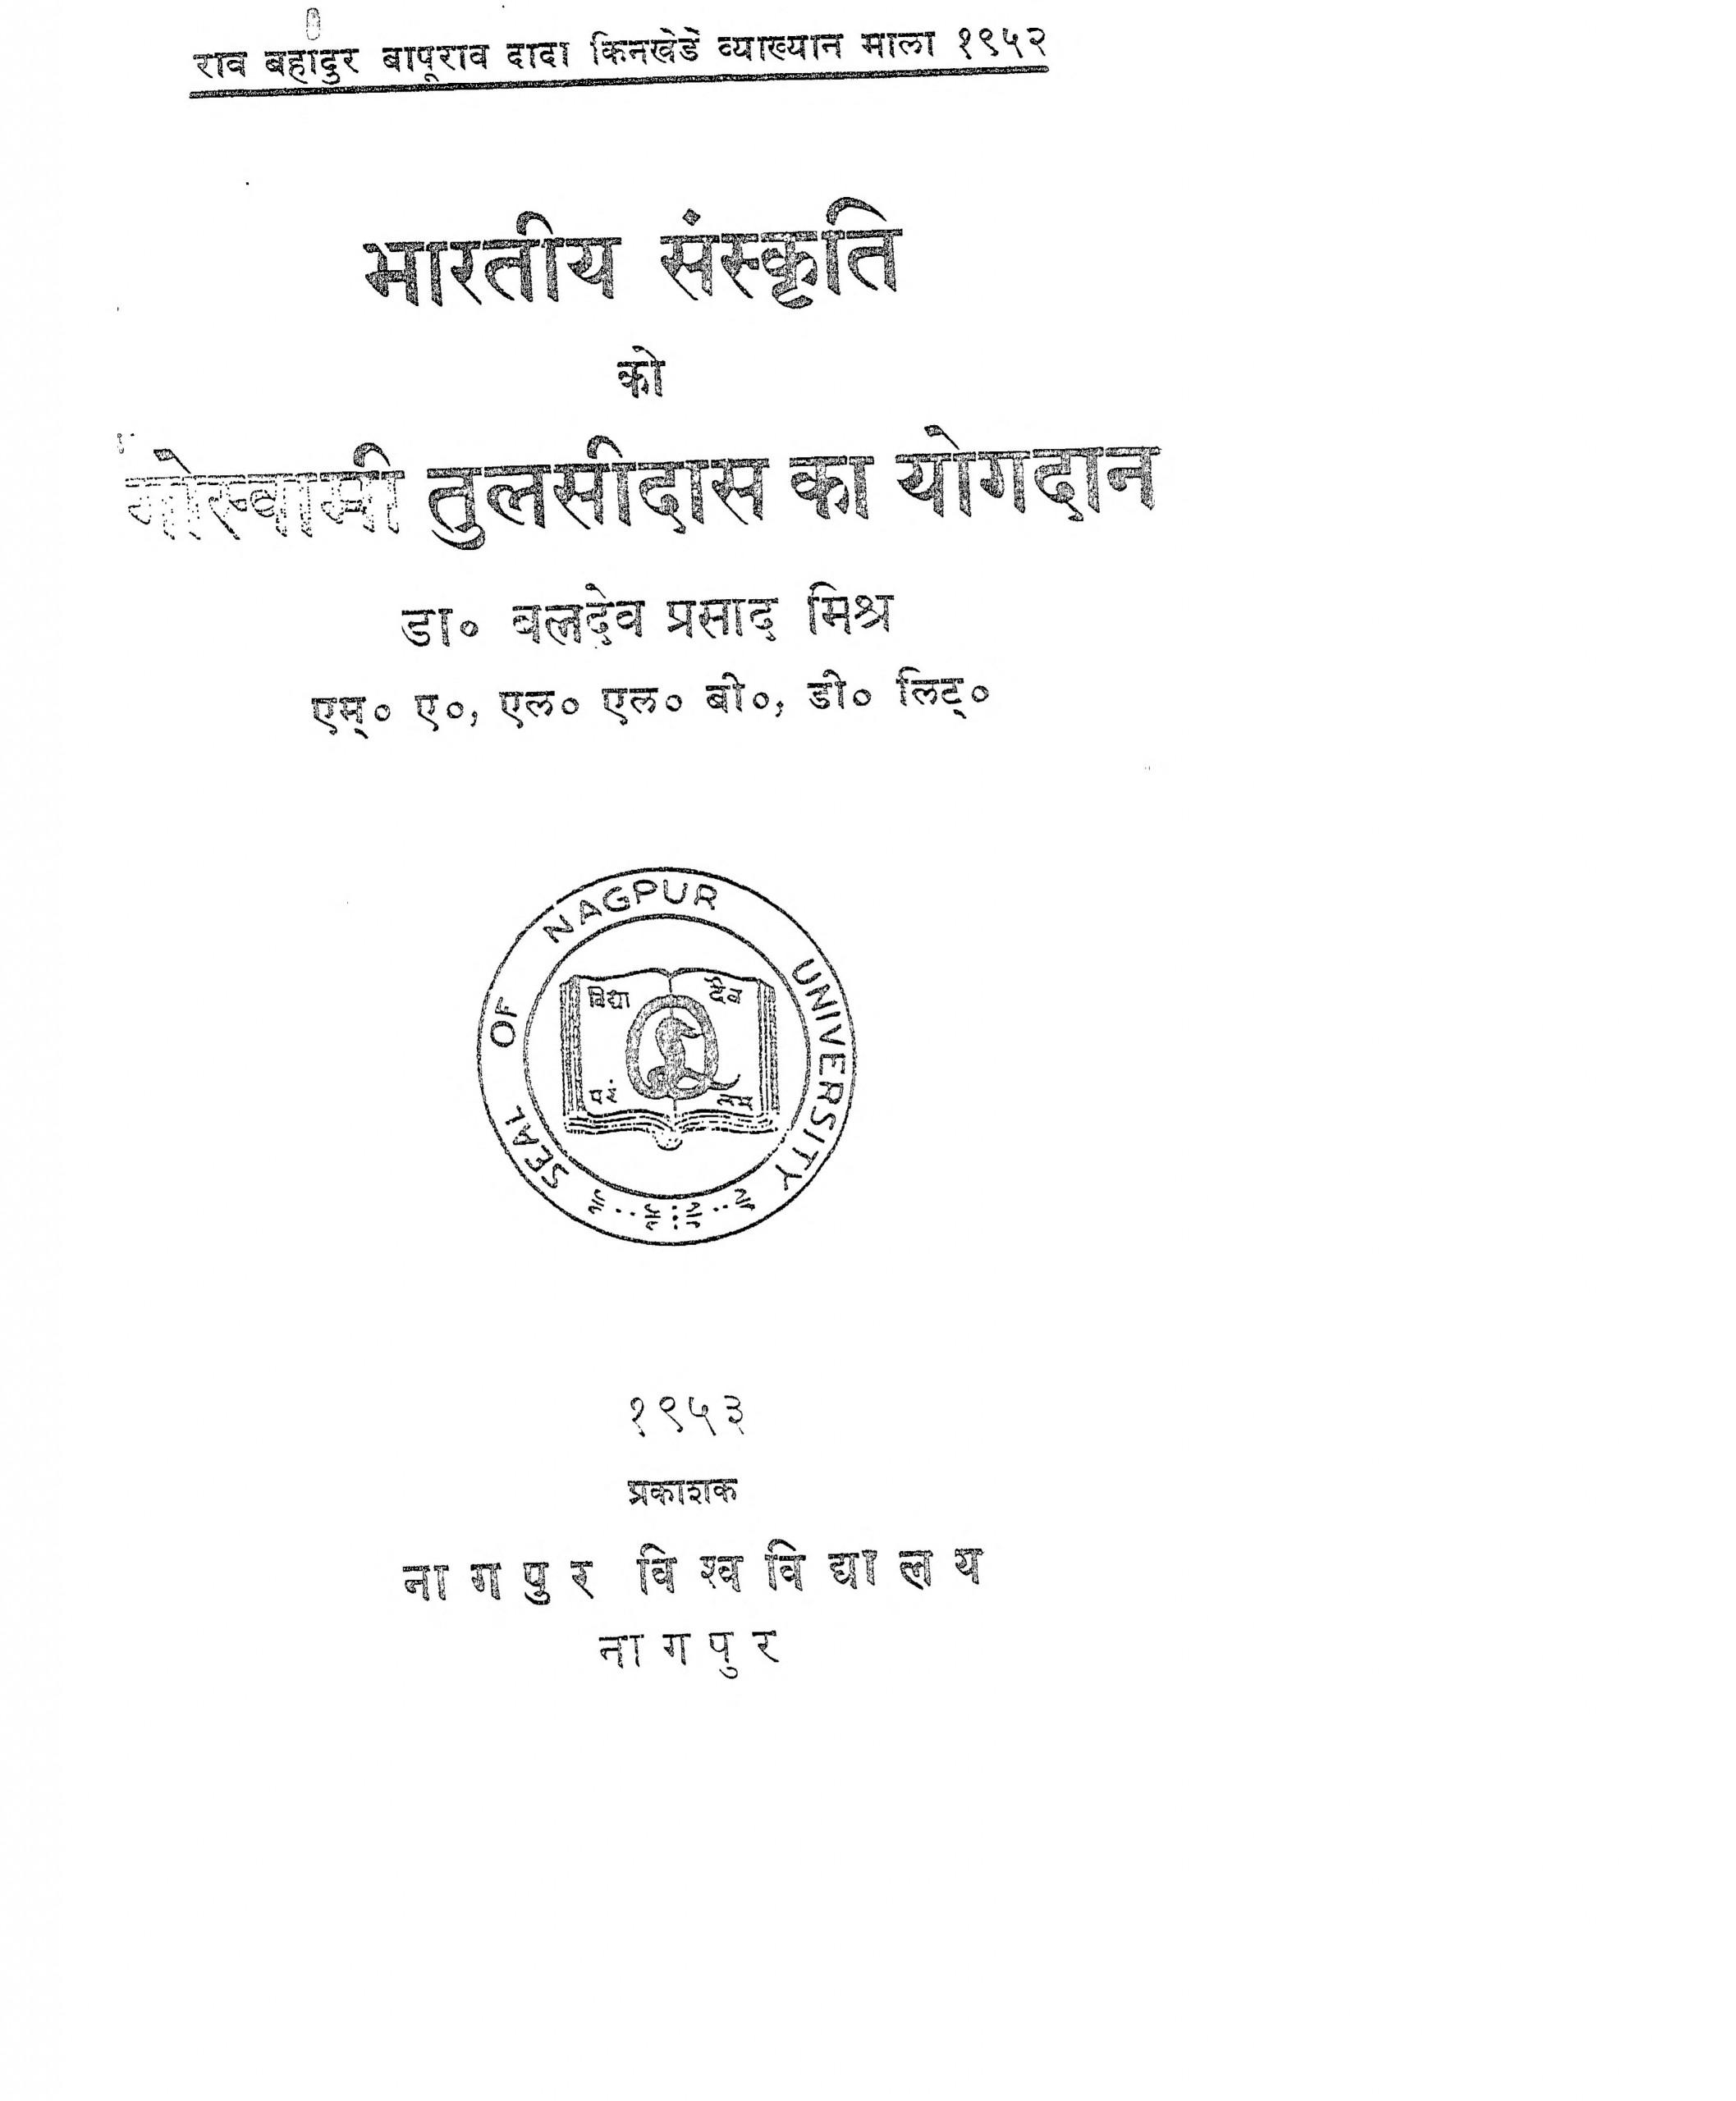 Book Image : भारतीय संस्कृति को गोस्वामी तुलसीदास का योगदान - Bharatiya Sanskriti Ko Goswami Tulsidas Ka Yogdaan